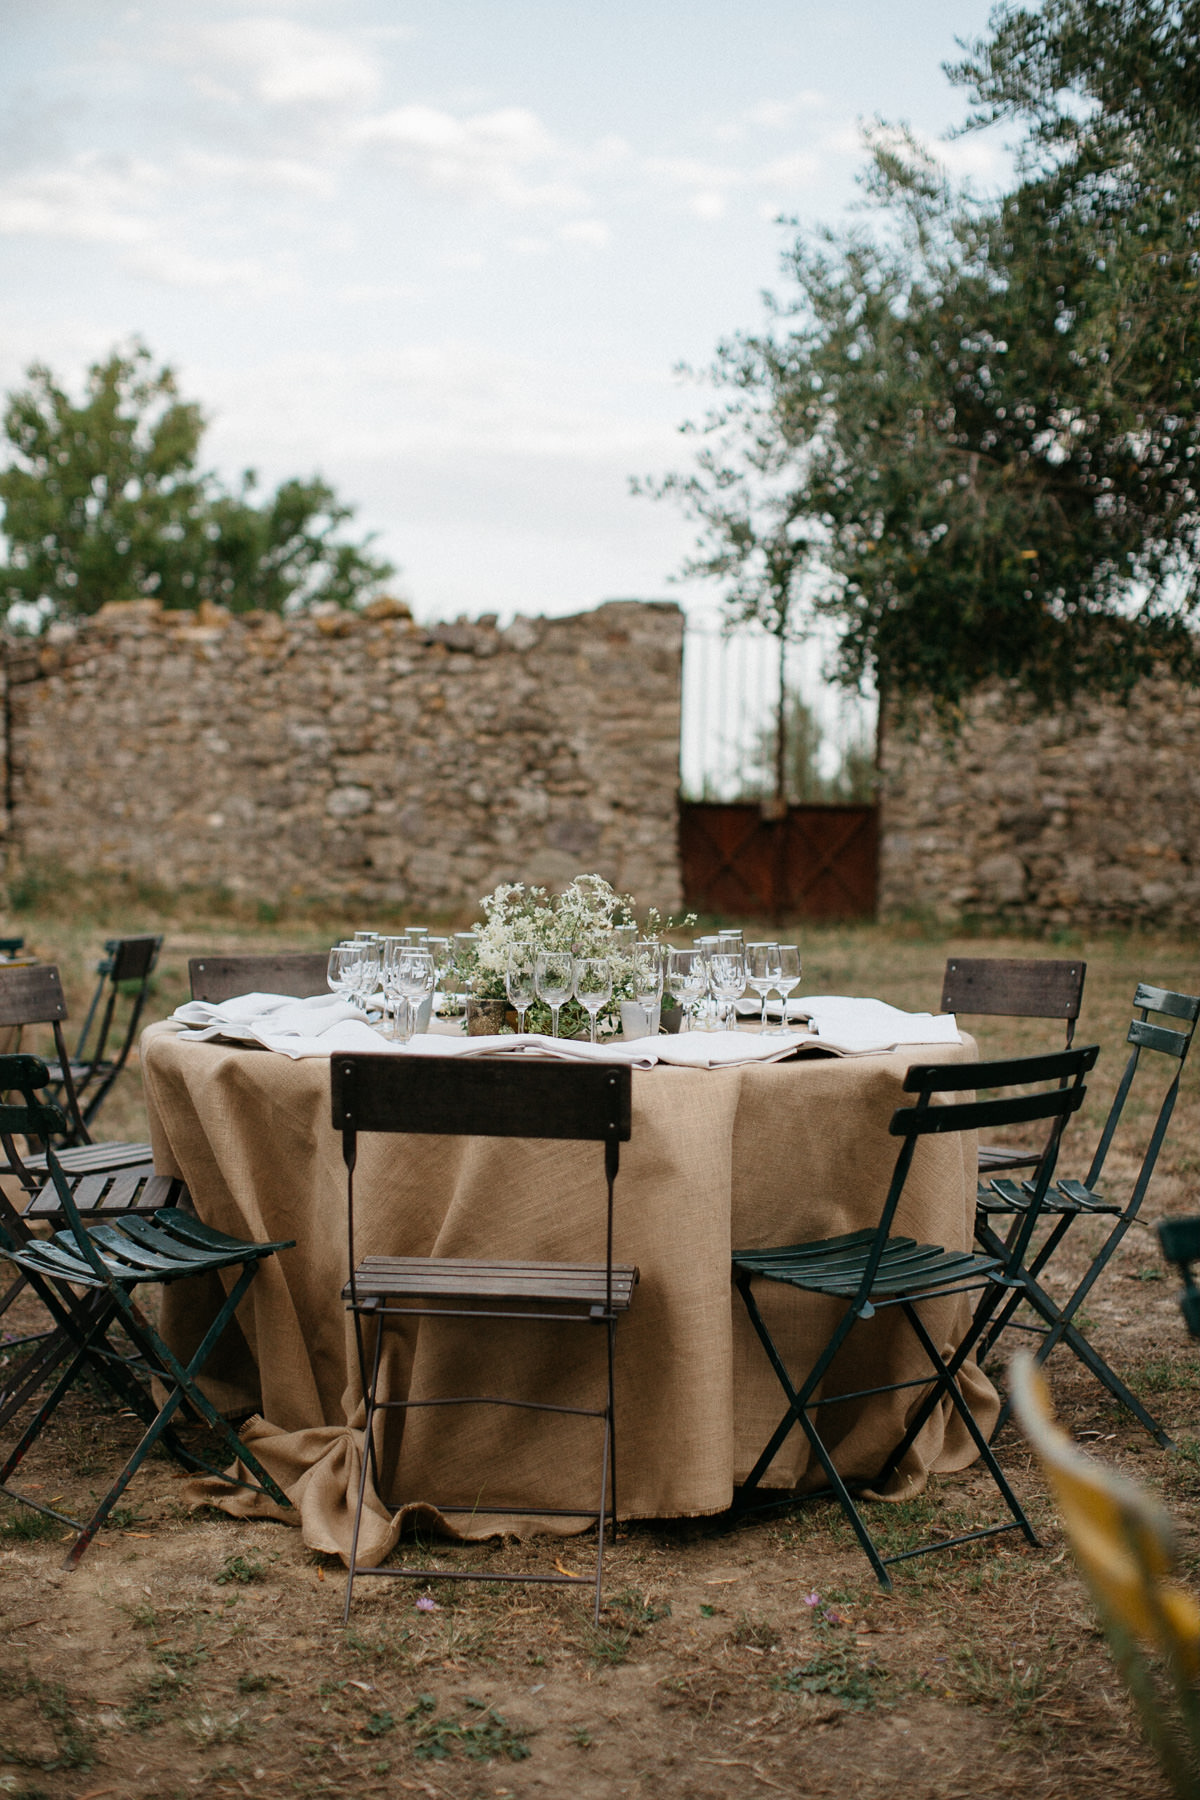 319-lifestories-photography-wedding-Frances-Jonah-2017-MK3_1055